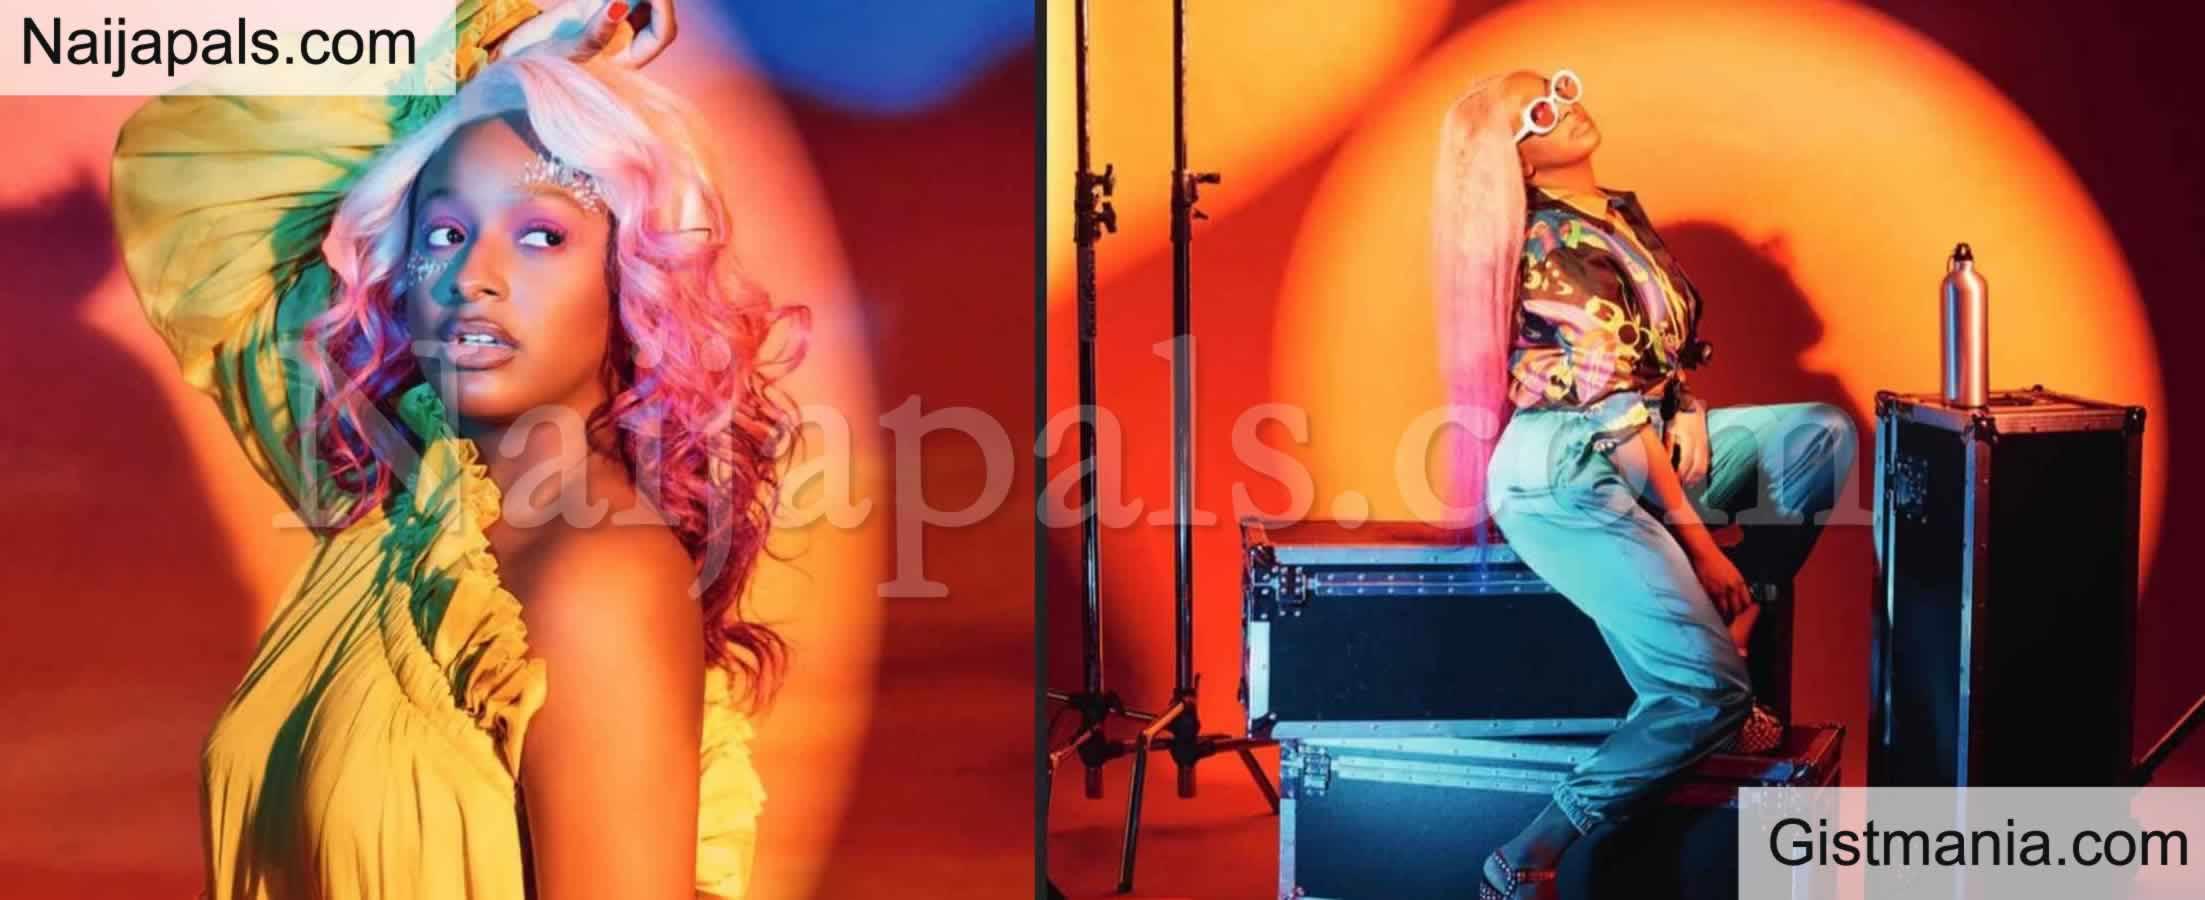 <img alt='.' class='lazyload' data-src='https://img.gistmania.com/emot/kiss.gif' /> PHOTOS: <b>DJ Cuppy Looks Gorgeous As She Graces Cover Of VirginAtlantic's Inflight Magazine</b>